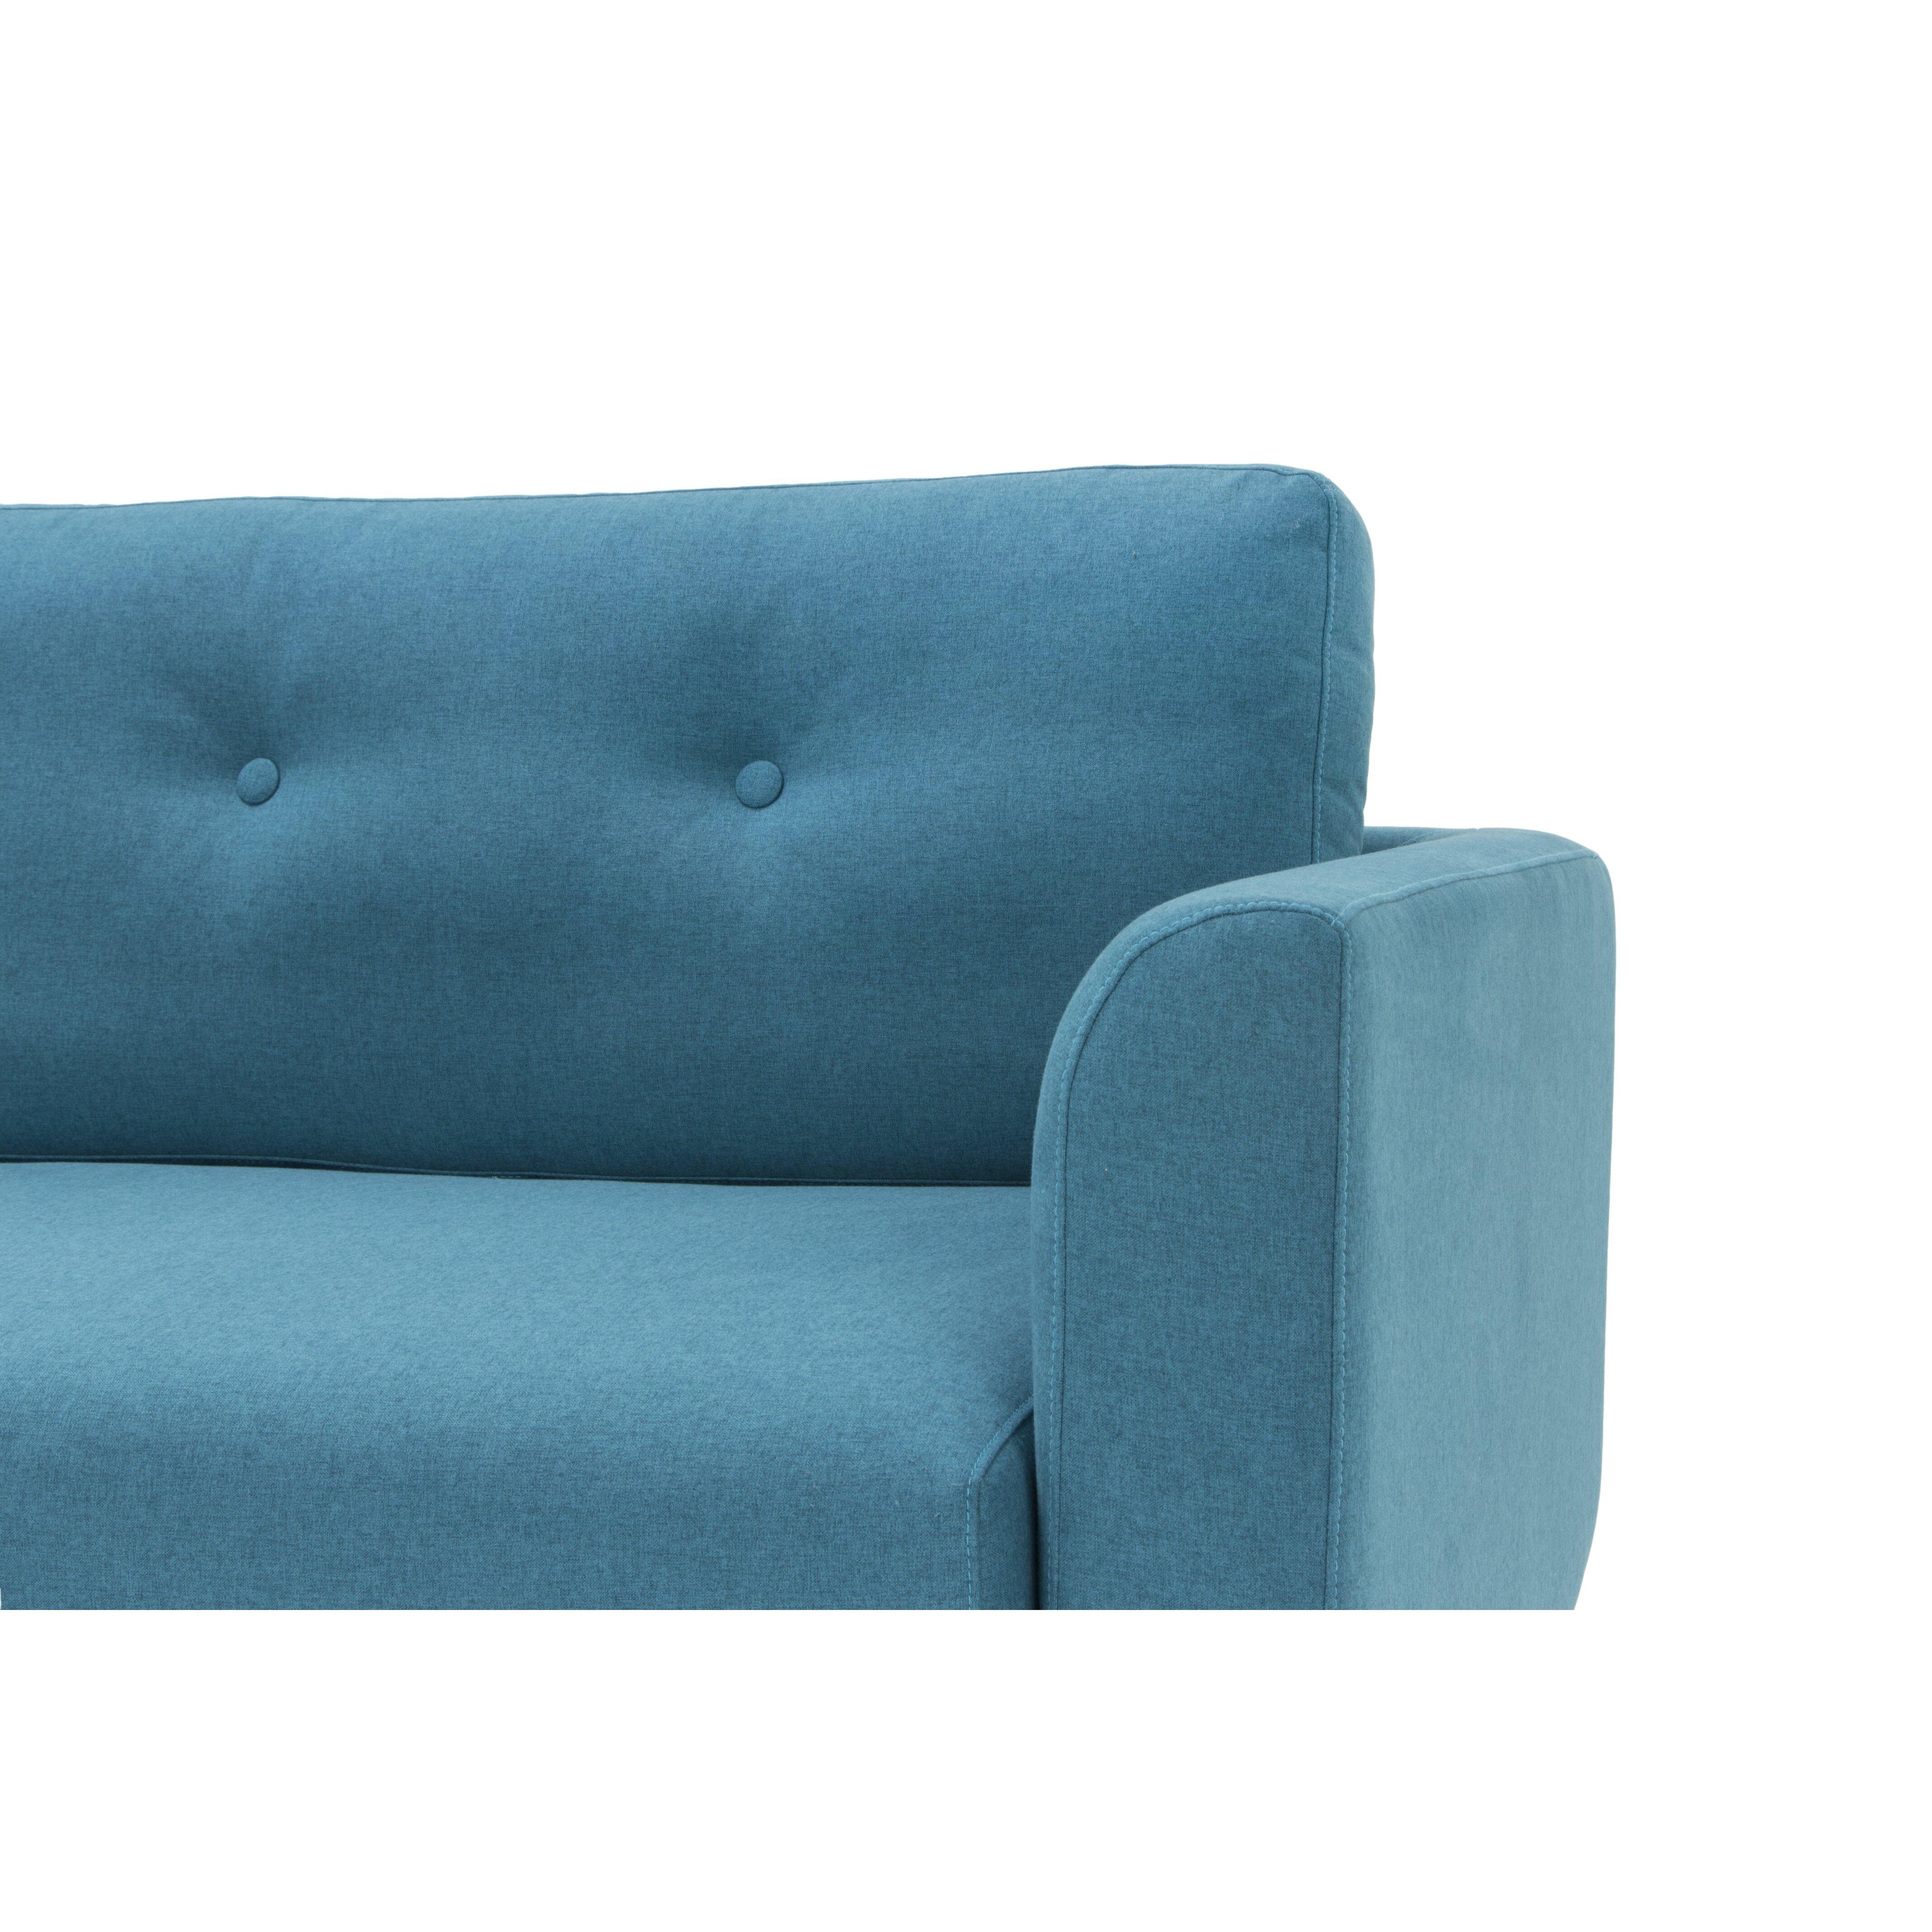 Nordic upholstery freya sofa wayfair for Sofa nordic